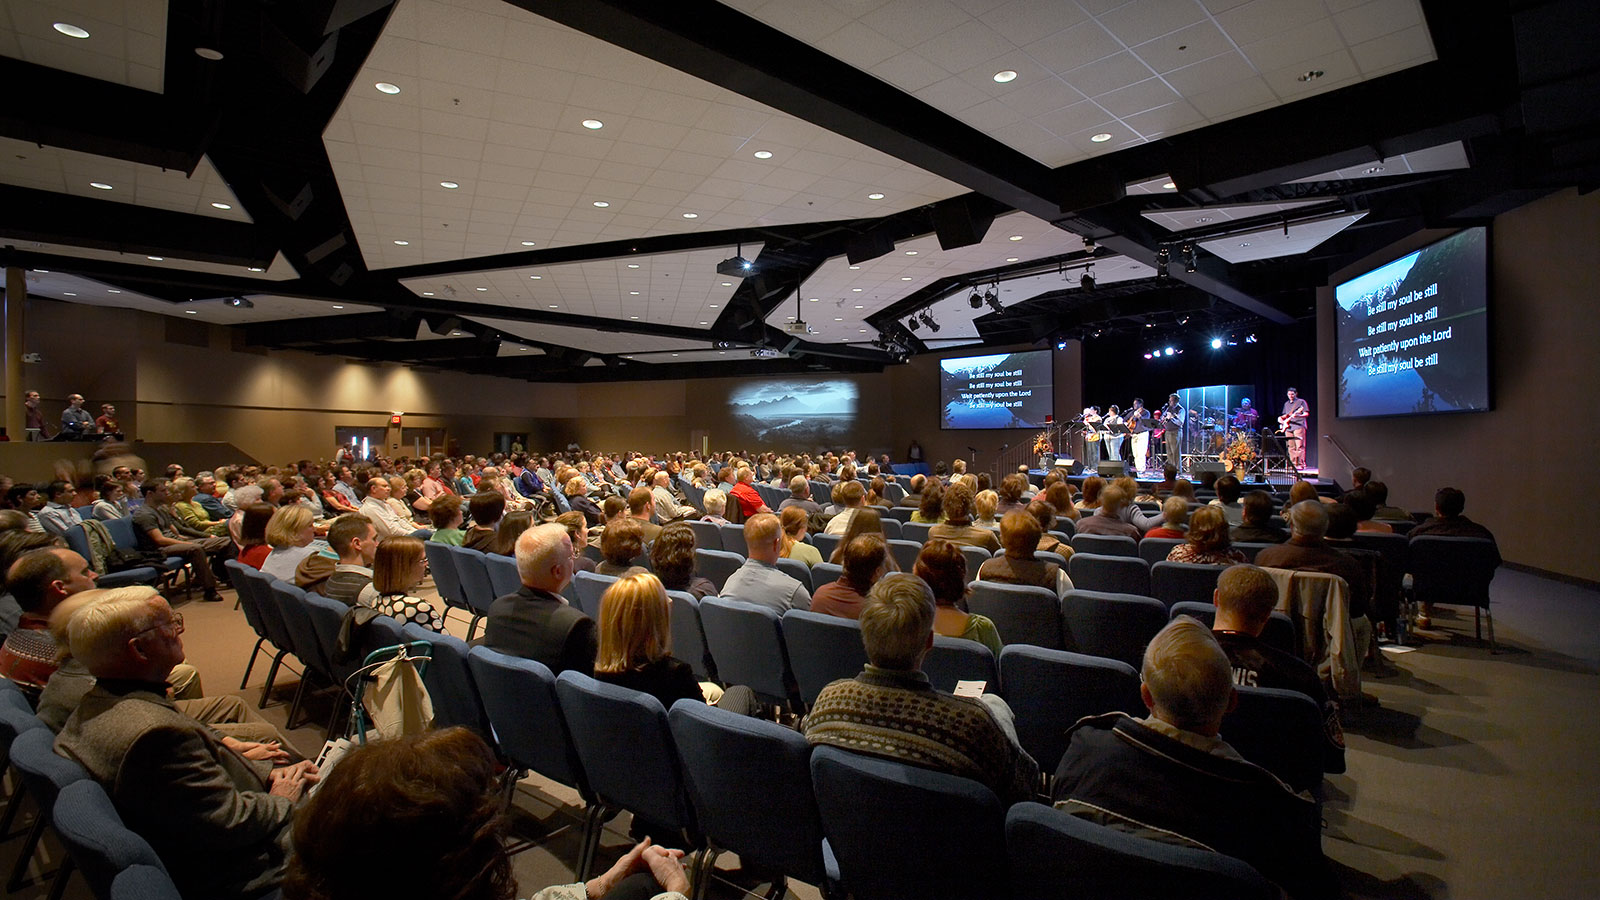 Grace-Fellowship-Church---Phase-1-Auditorium-04.jpg